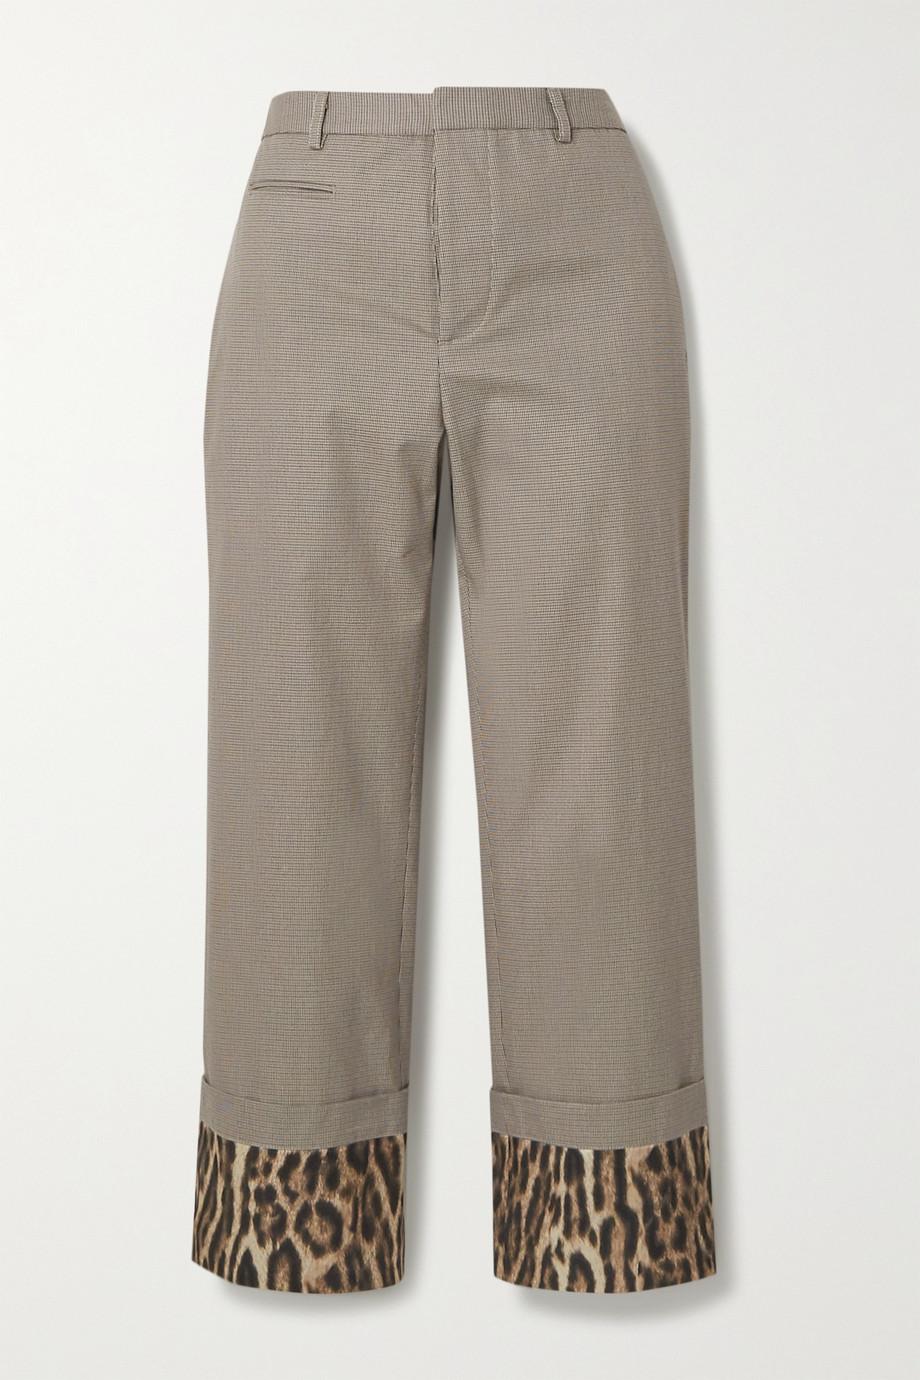 R13 Silk satin-trimmed houndstooth cotton straight-leg pants